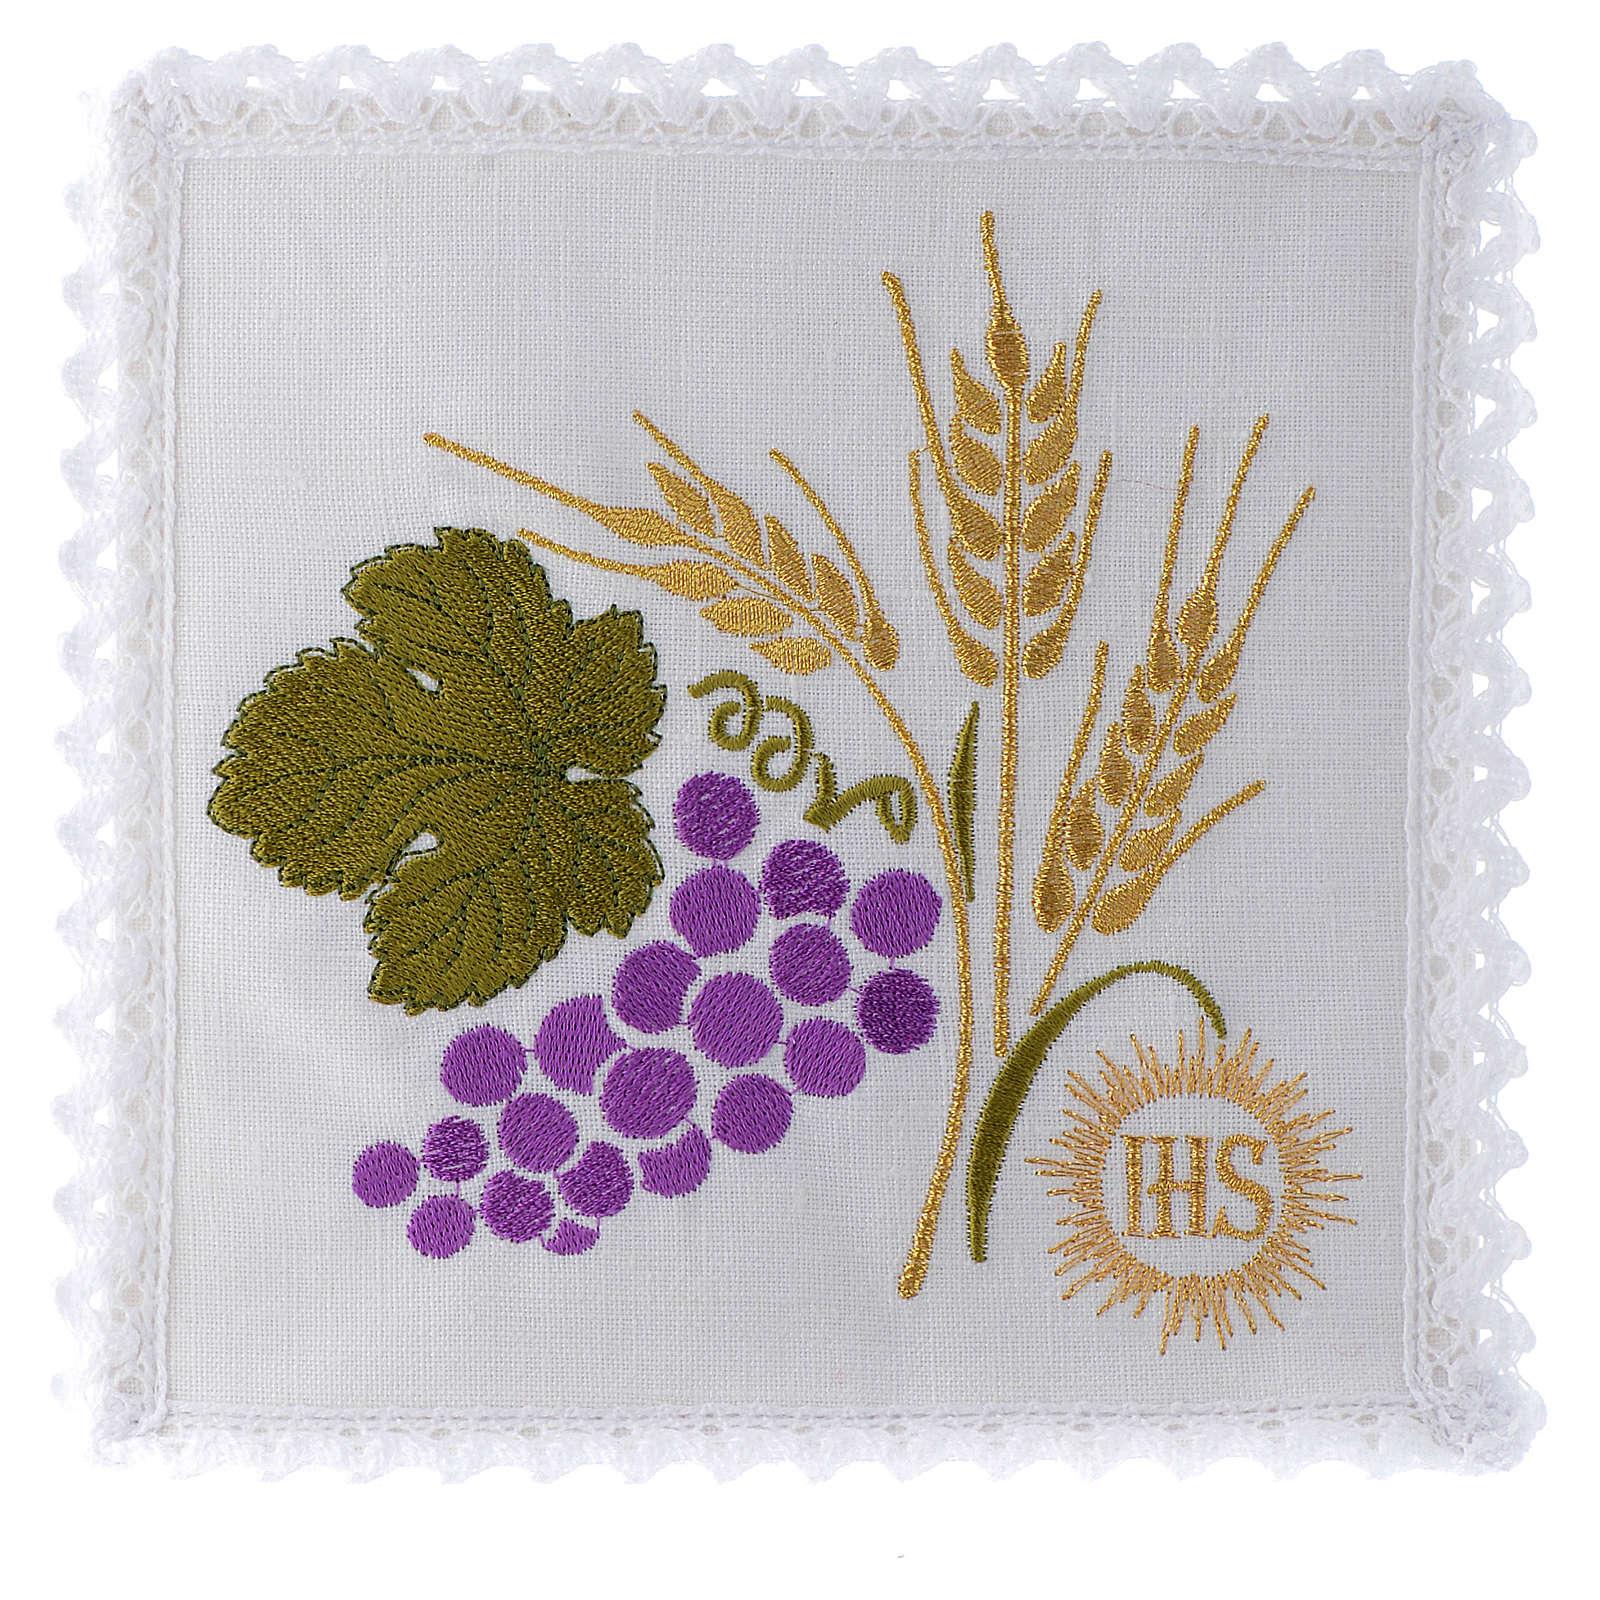 Servicio de altar 100% hilo uva espigas 4